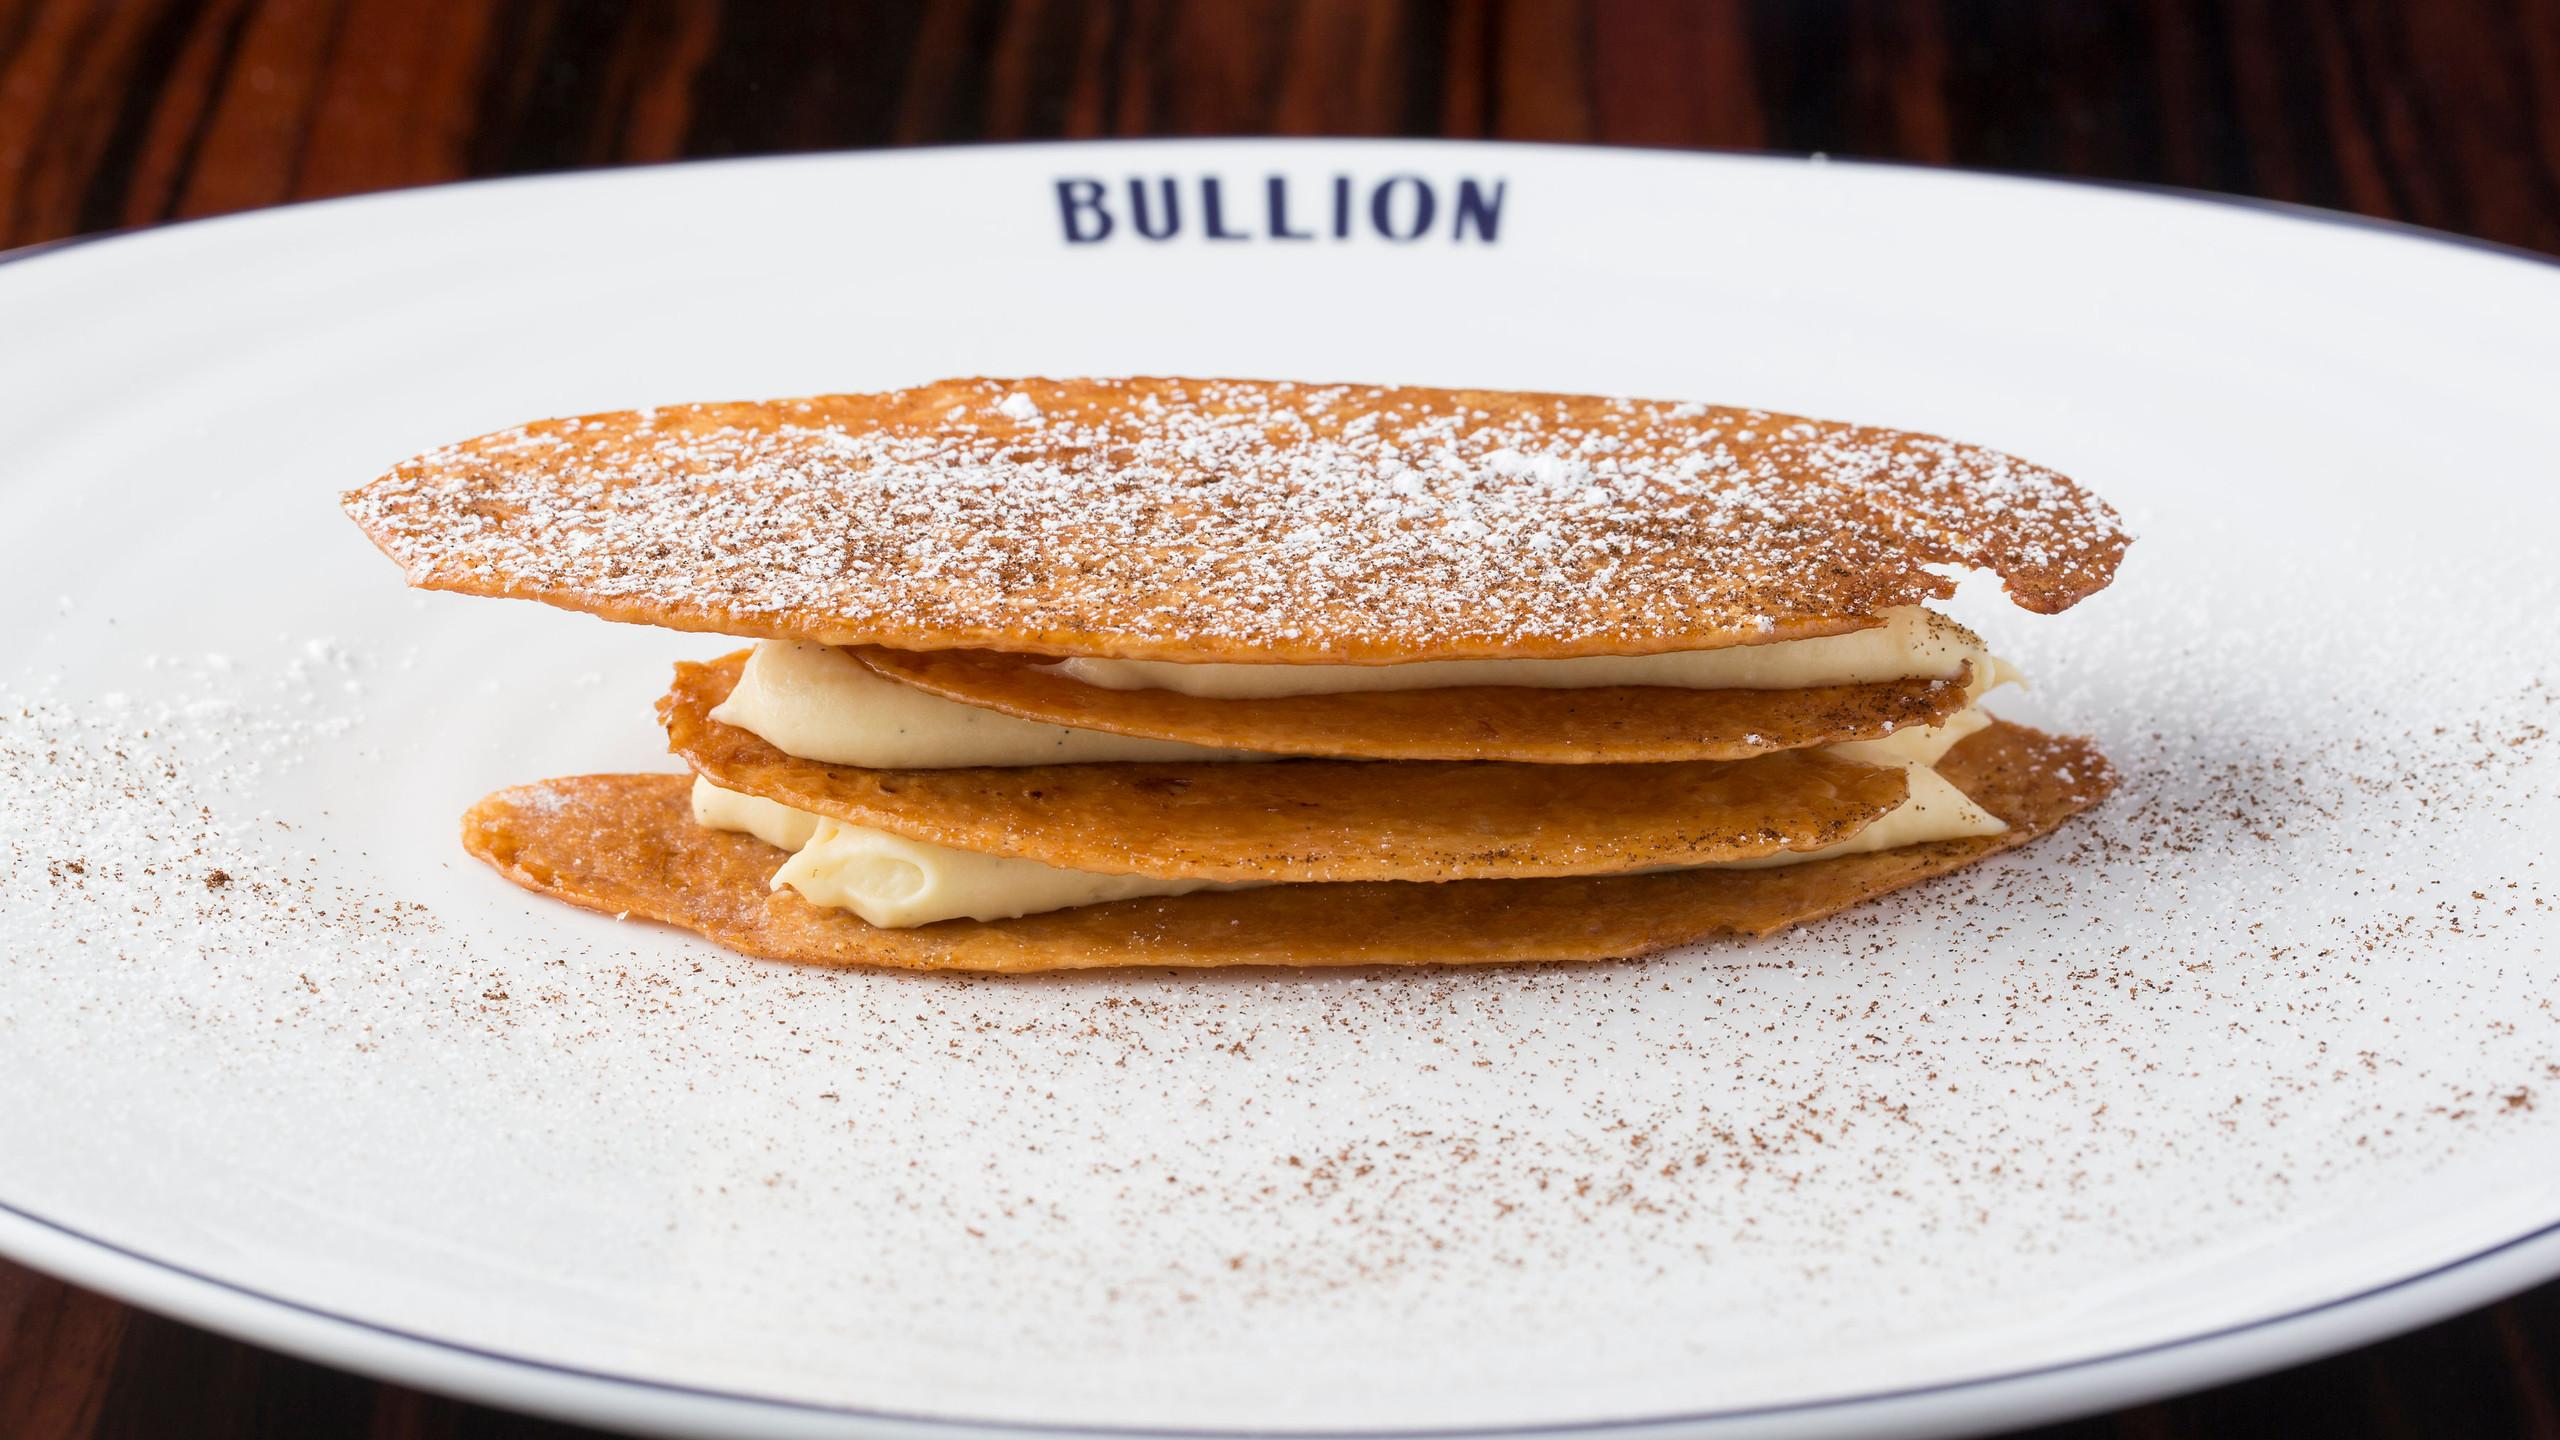 Mille Feuille (arlette puff pastry, vanilla pastry cream, dulce de leche)